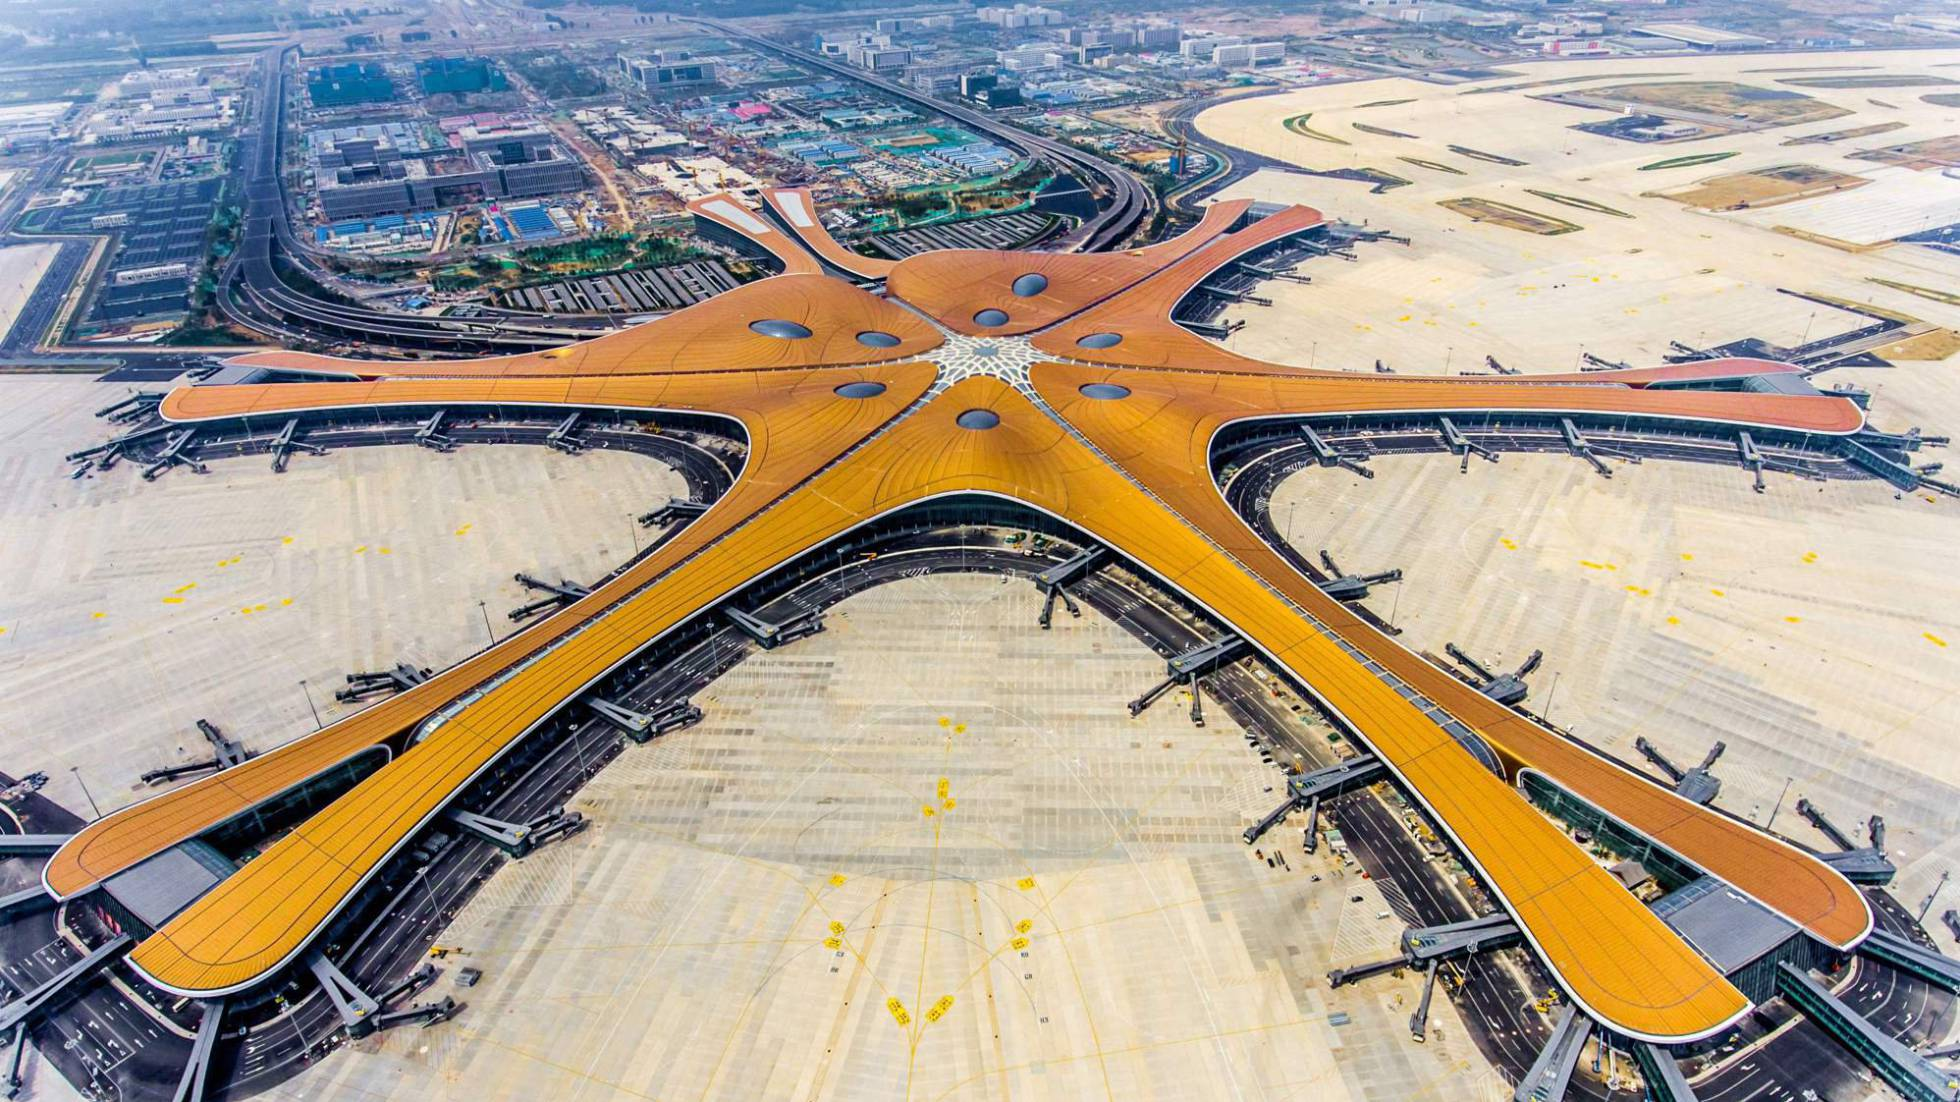 Dia 15 – Fin del viaje en Pekín